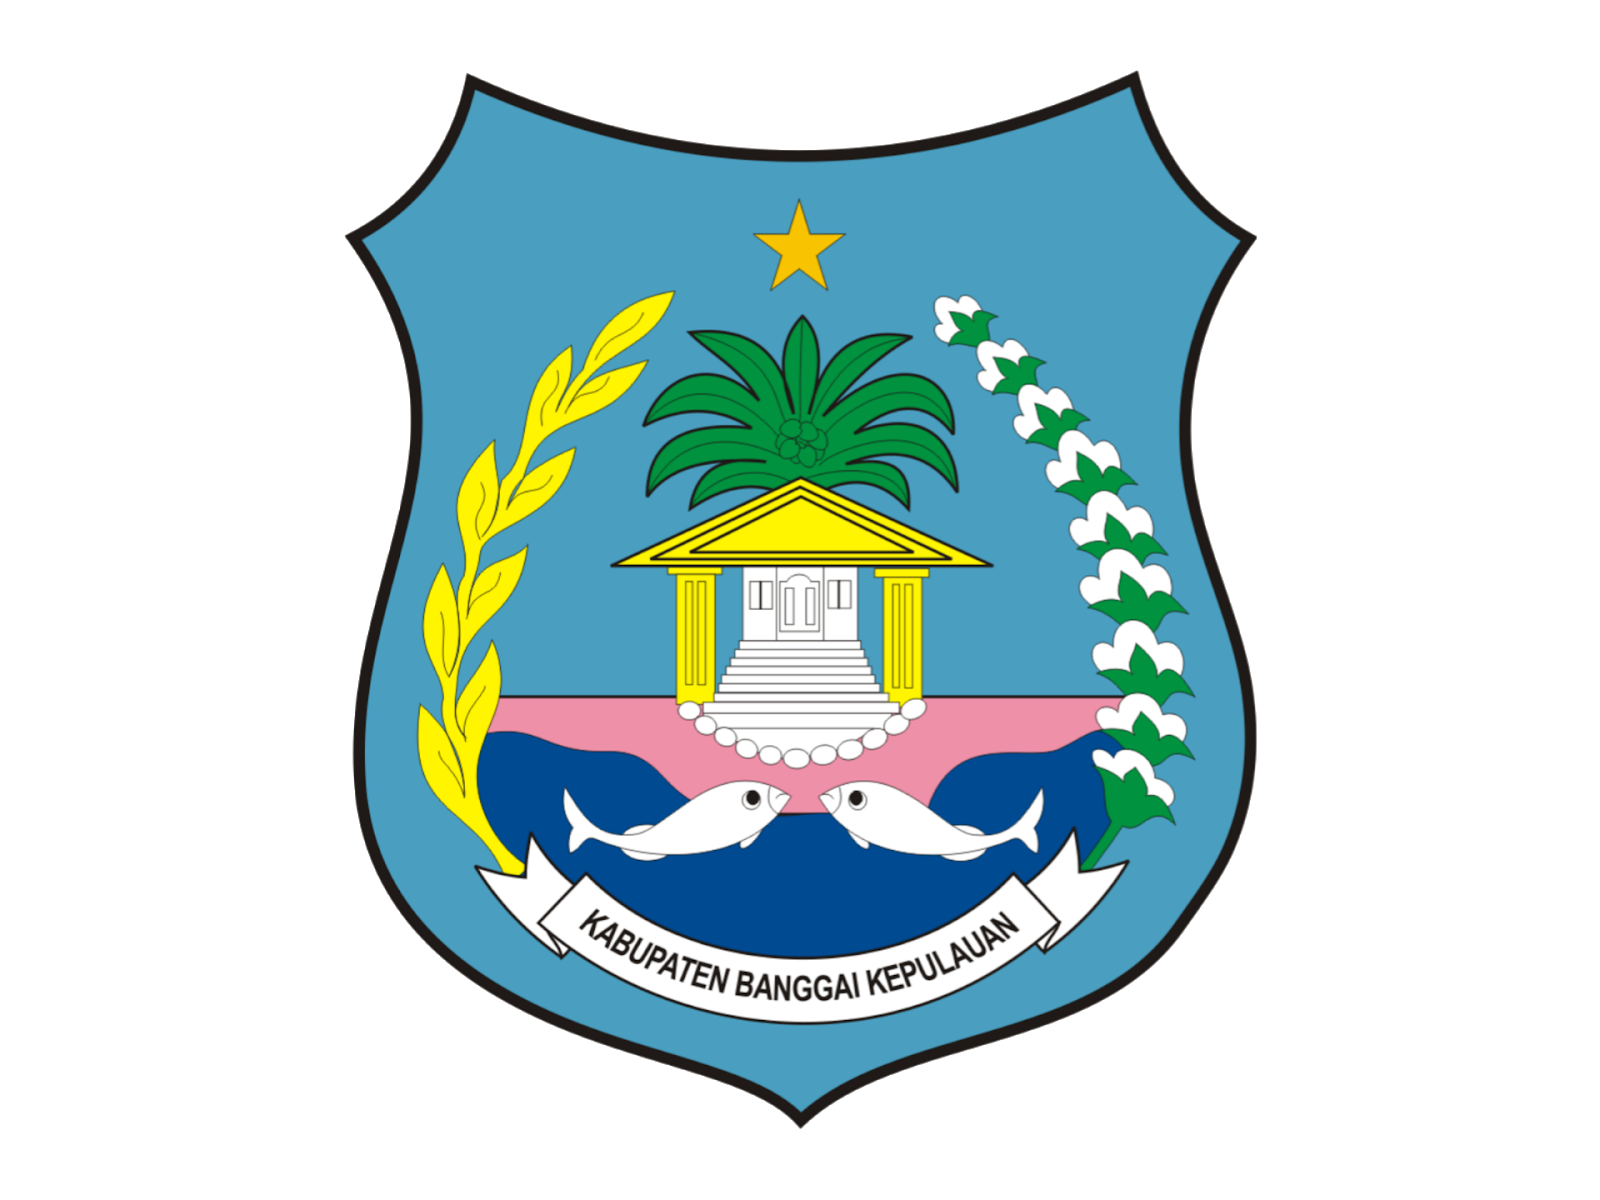 Logo Kabupaten Banggai Kepulauan Format PNG